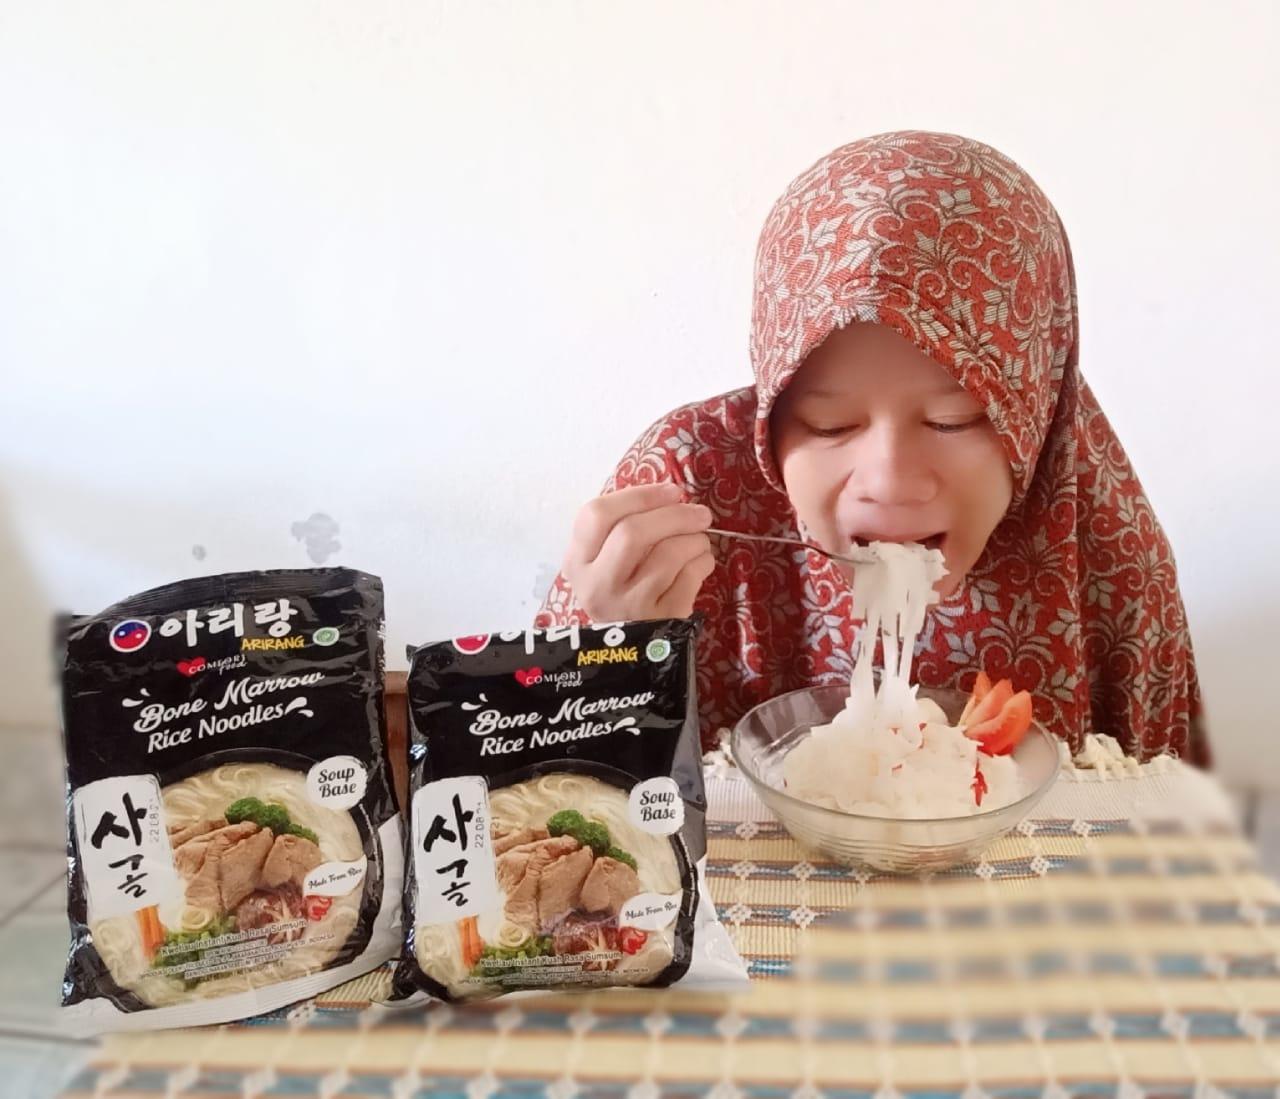 Mie halal Korea, Arirang